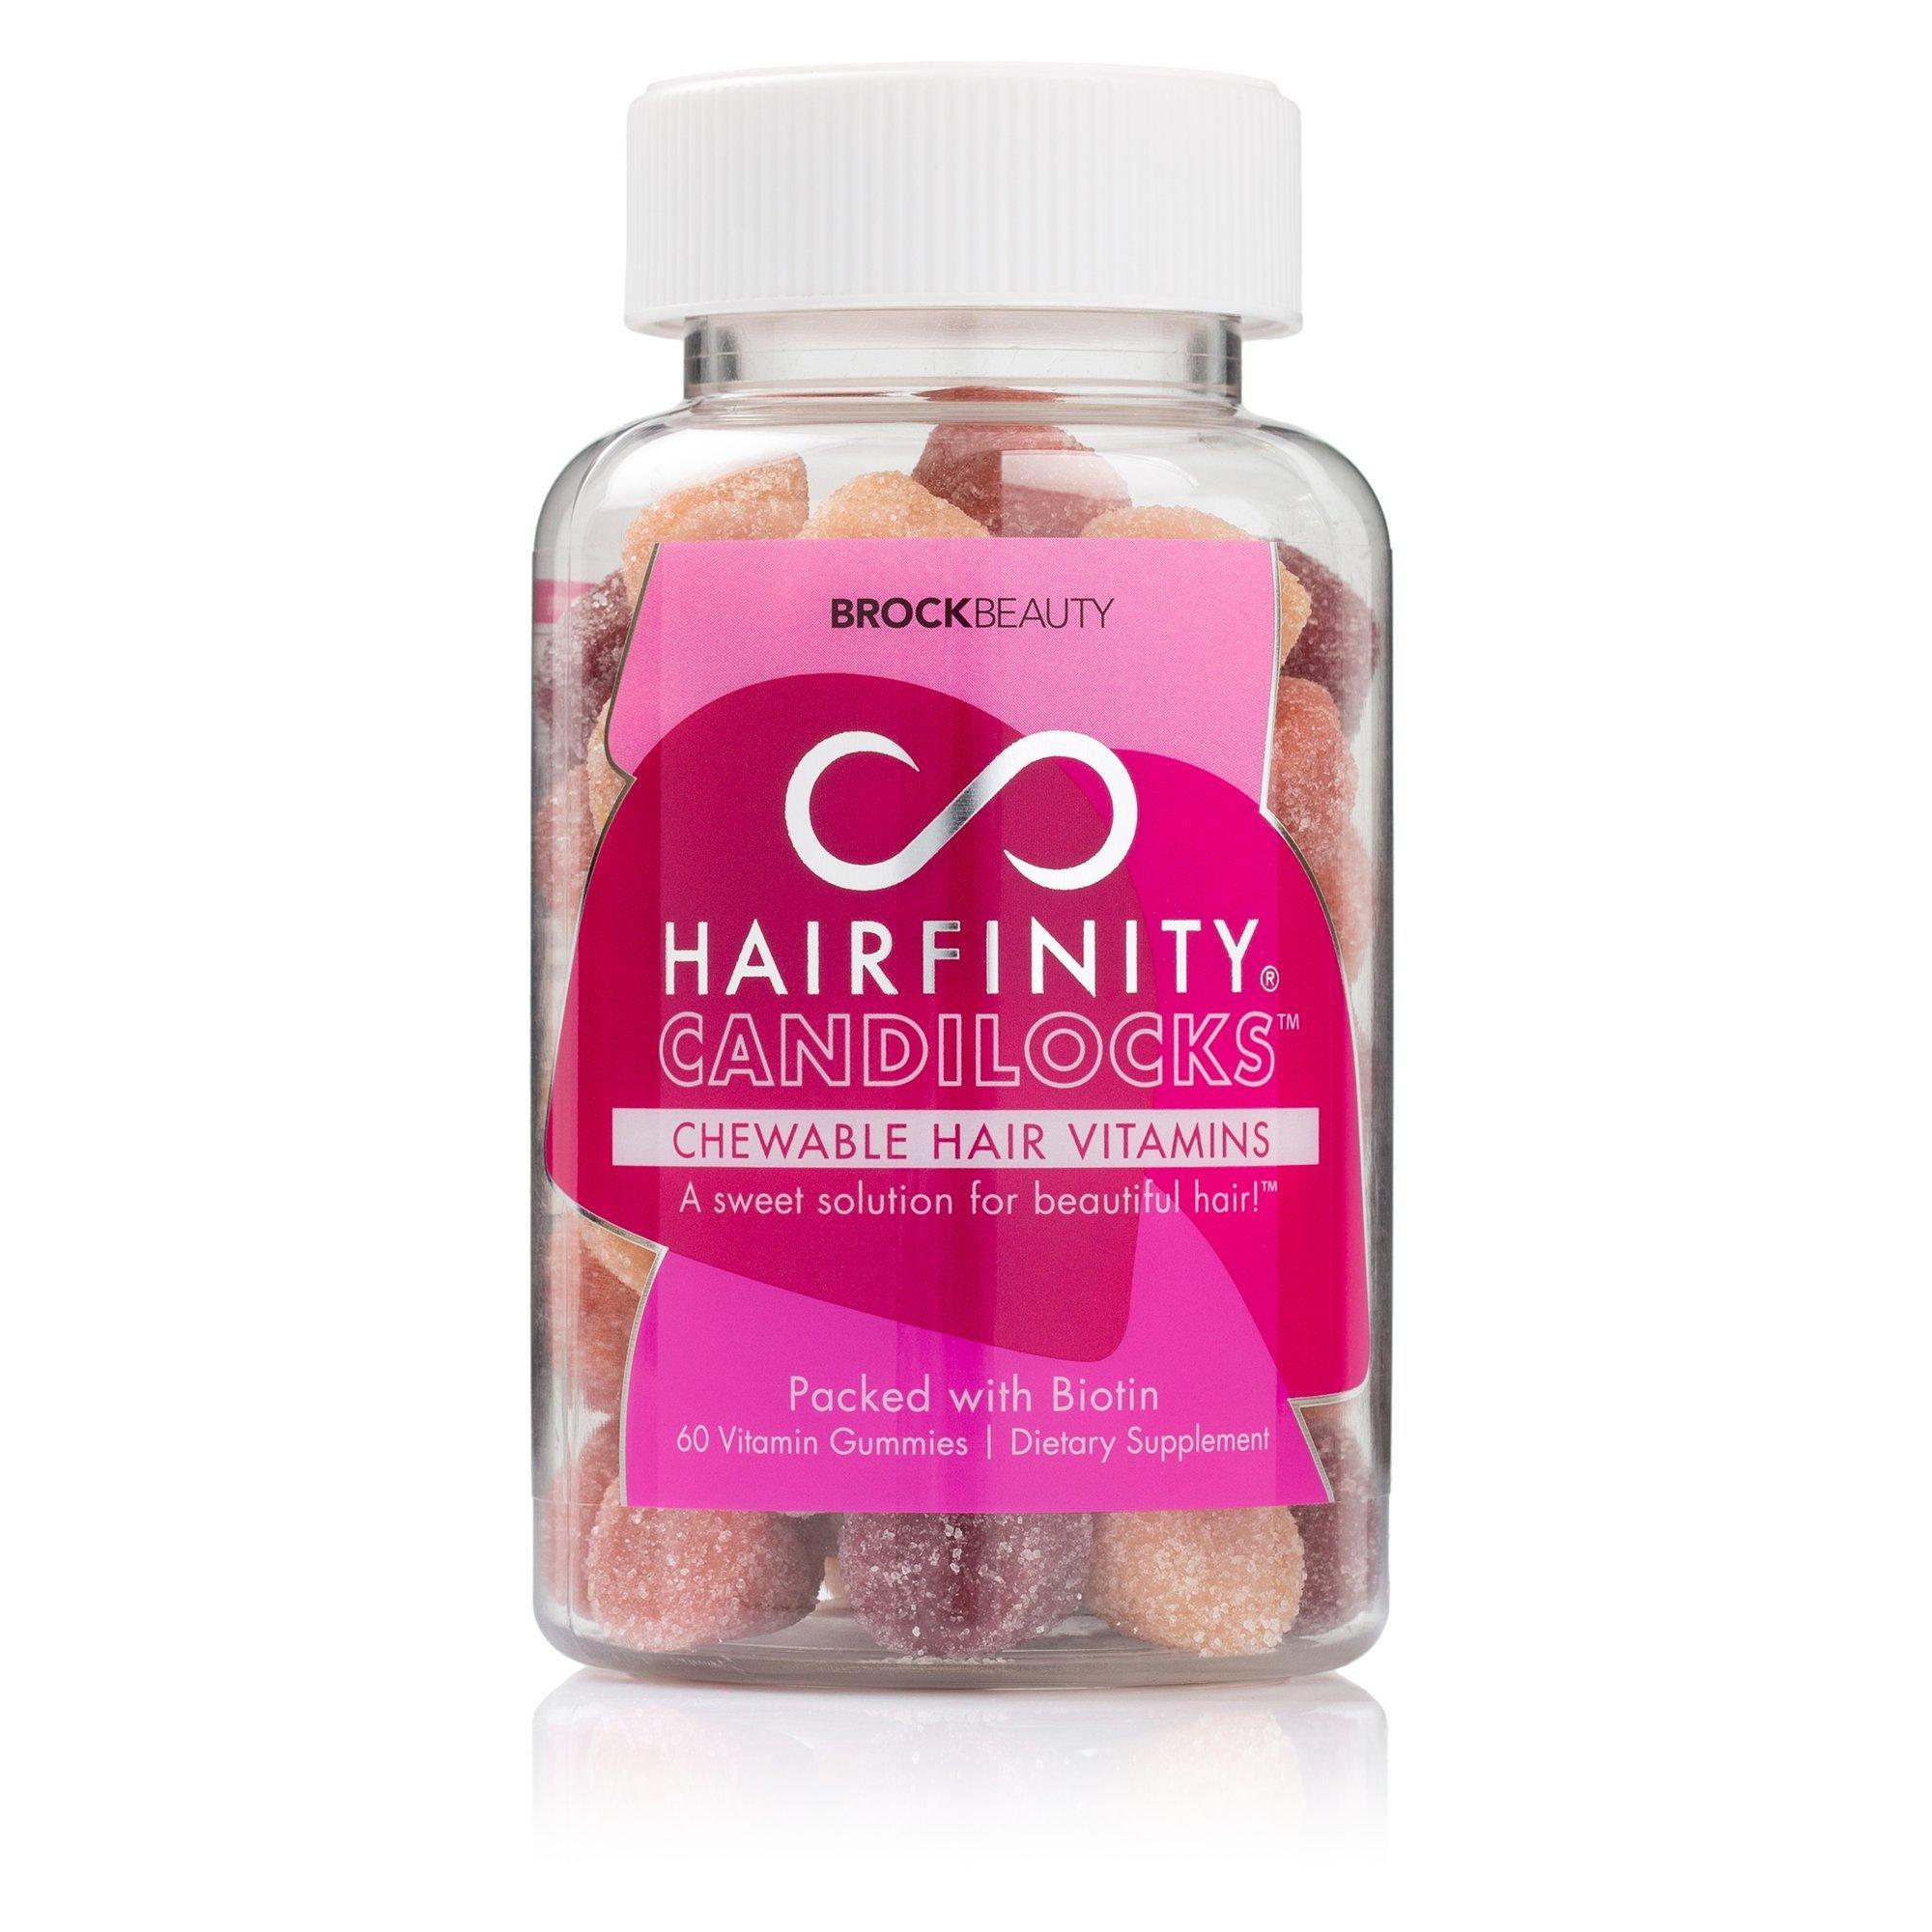 Hairfinity Candilocks Chewable Hair Vitamins 60 Gummies